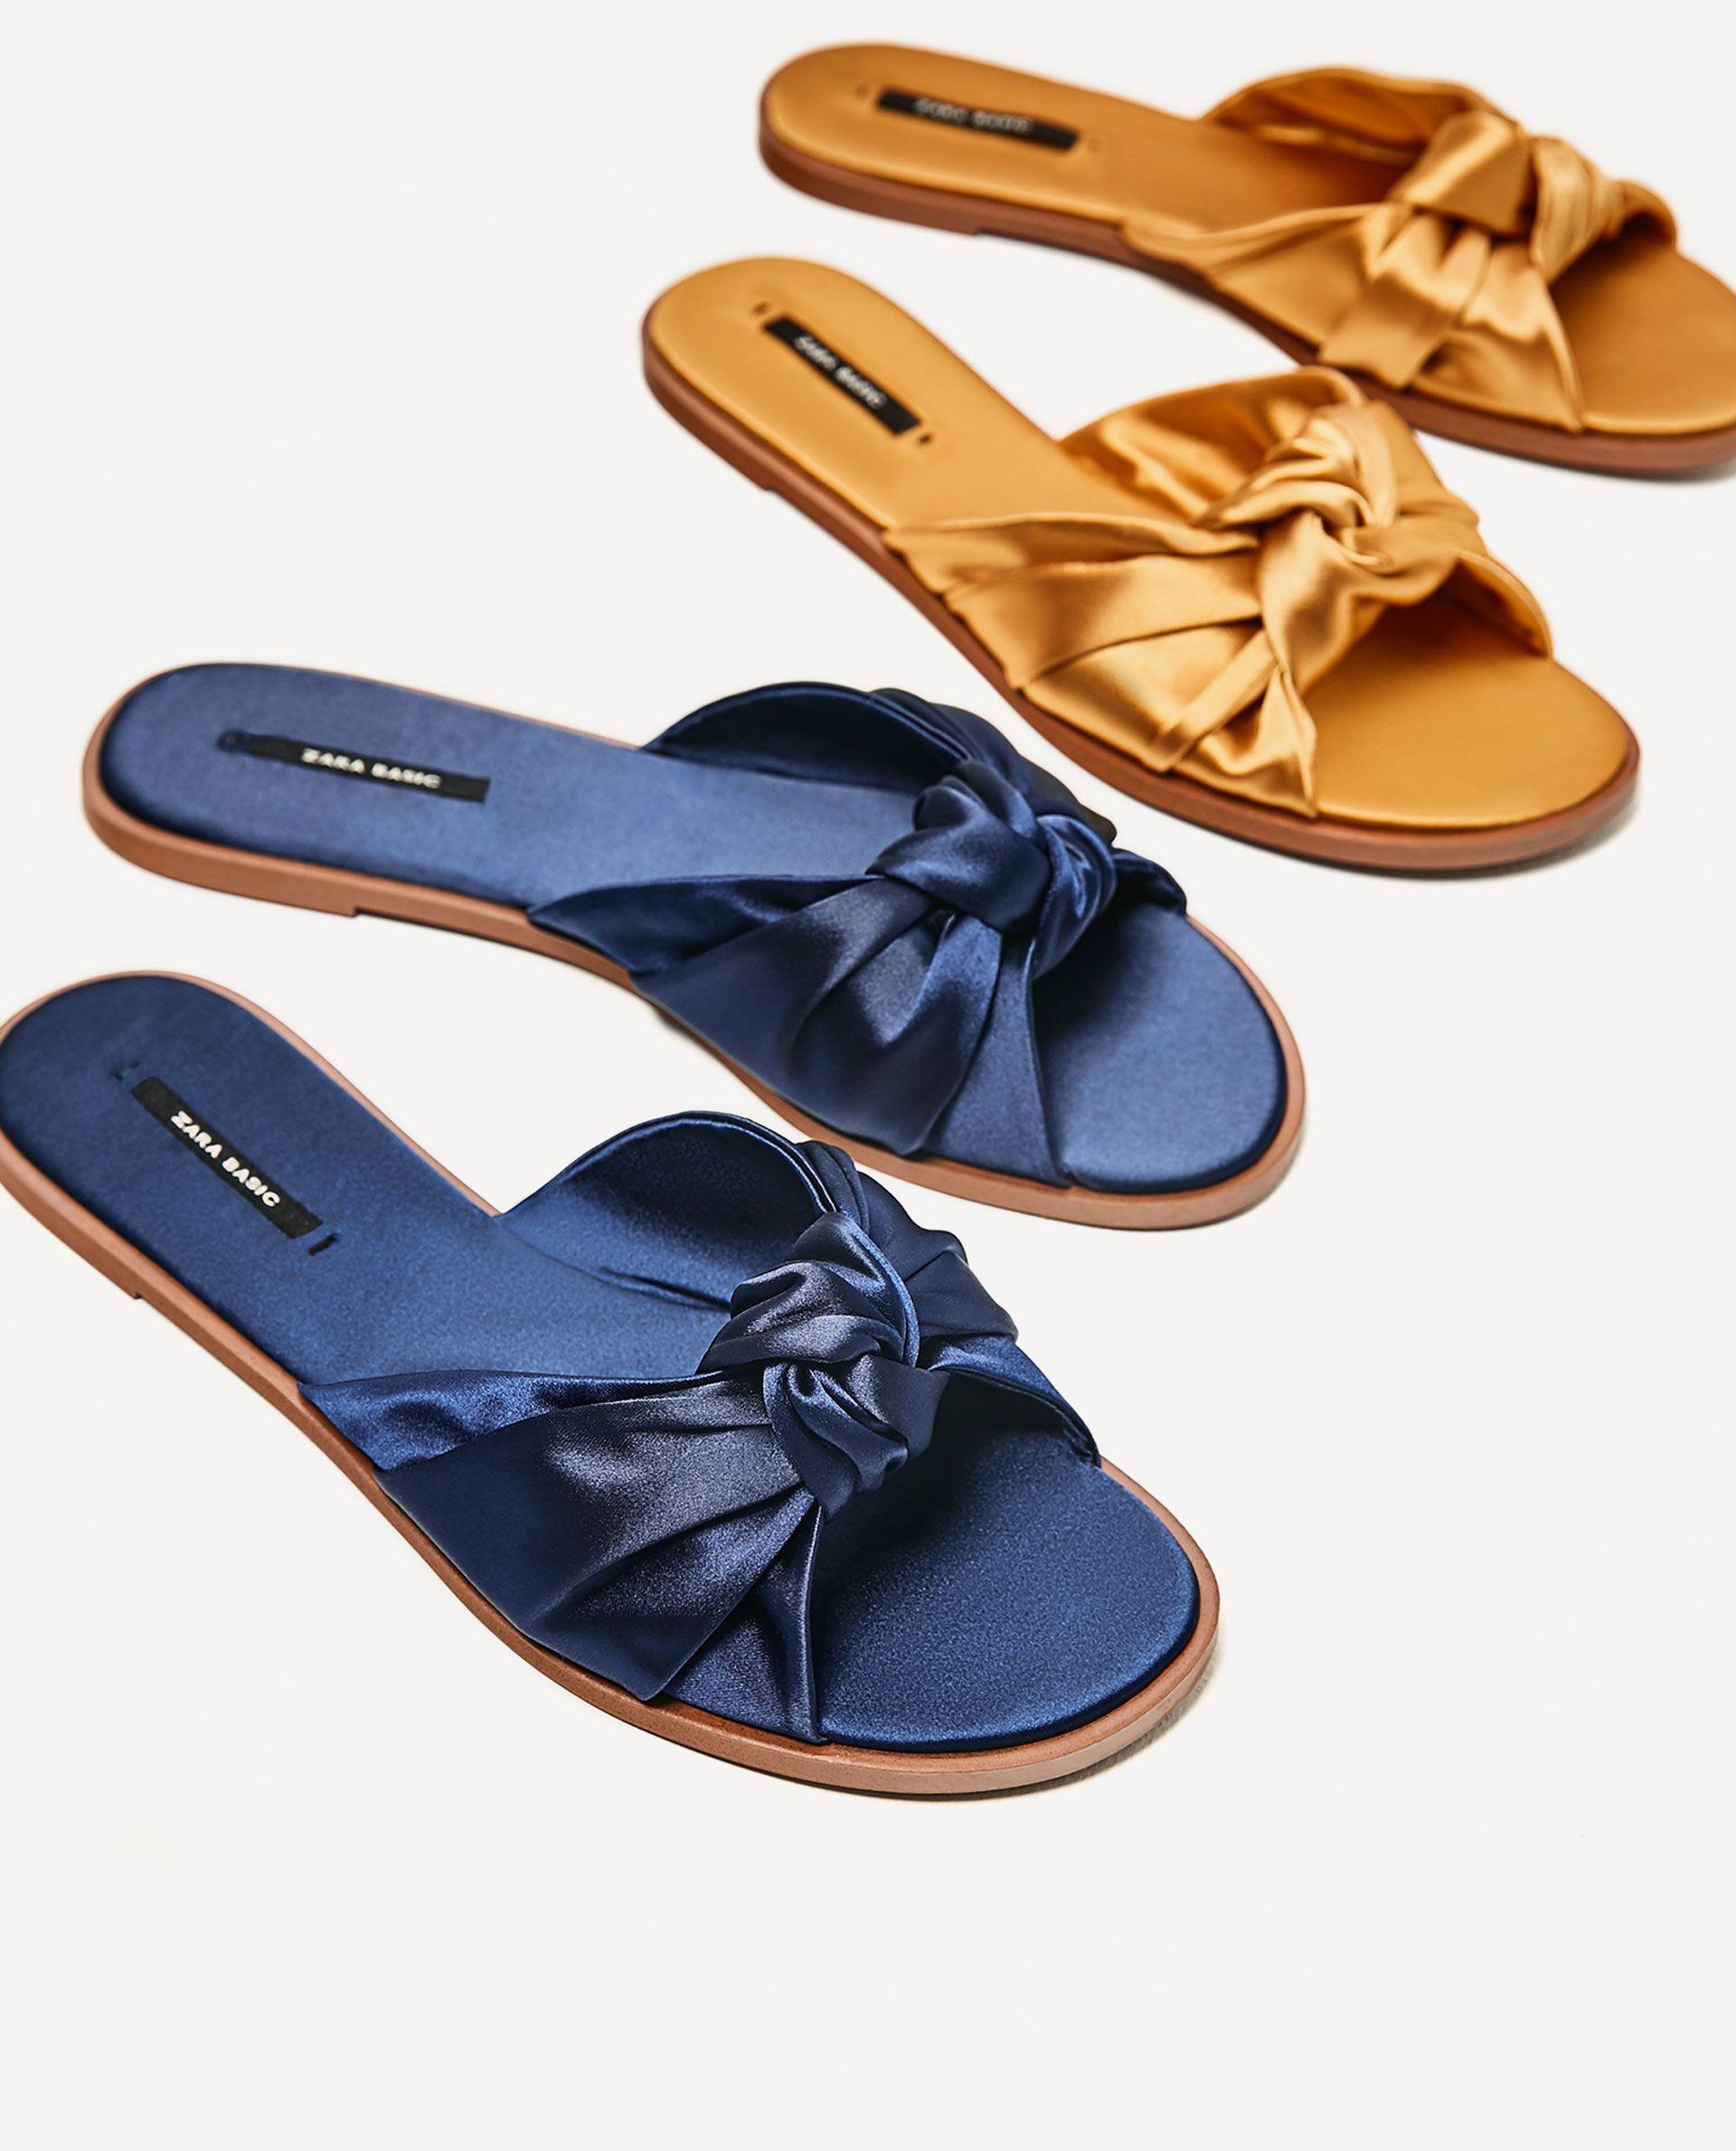 Elegante y elegante mujer zapatos Zara Sandalia plana azul V